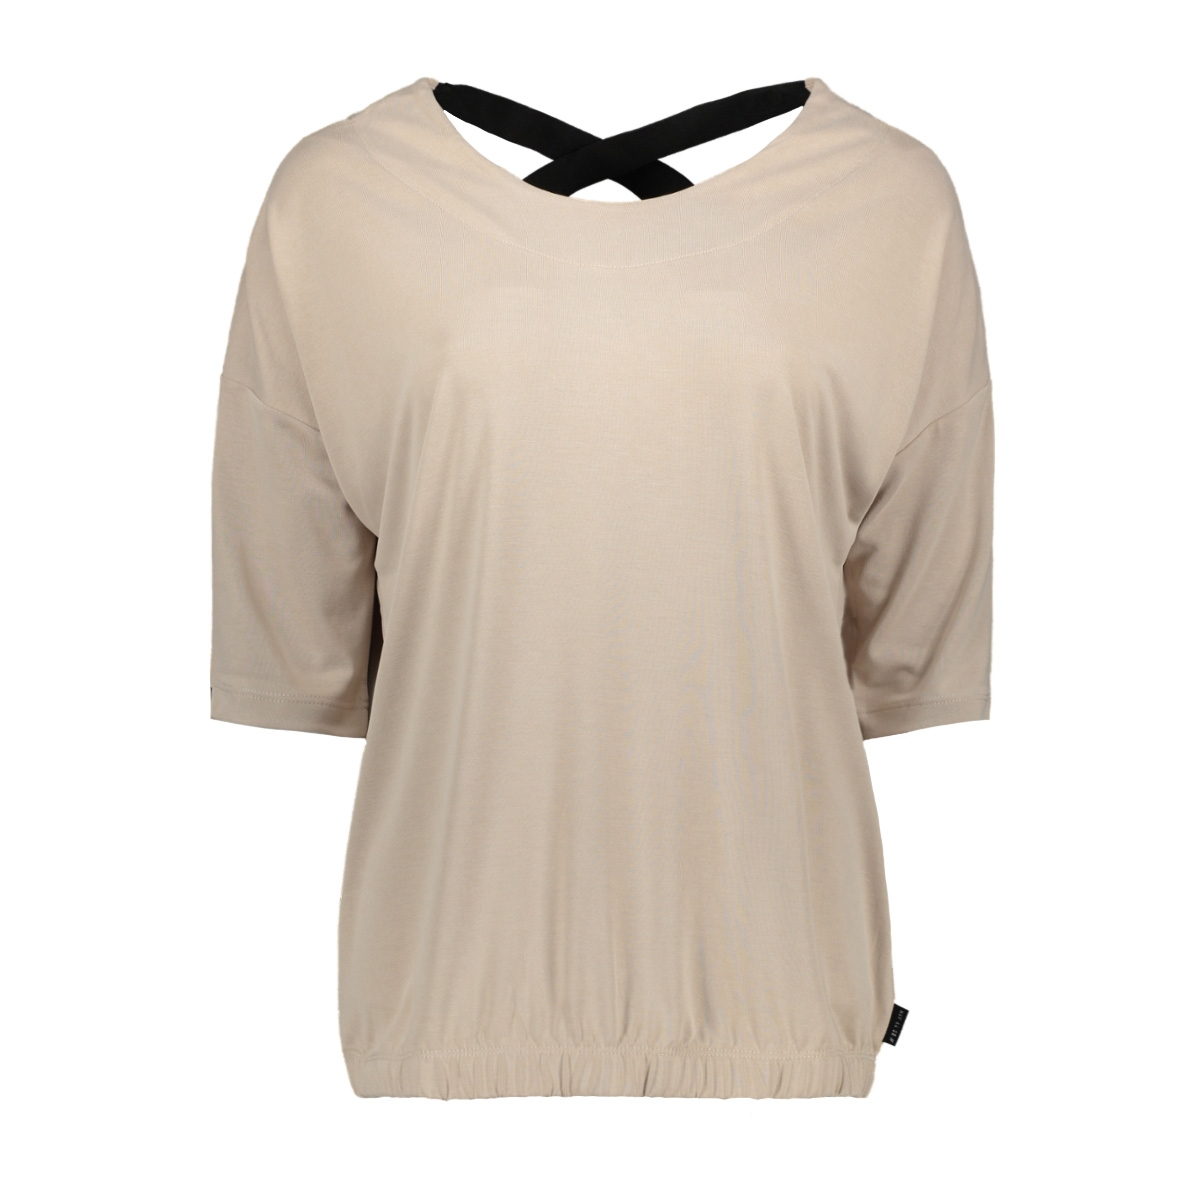 hero cupro look blouse 201 zoso t-shirt 0007 sand